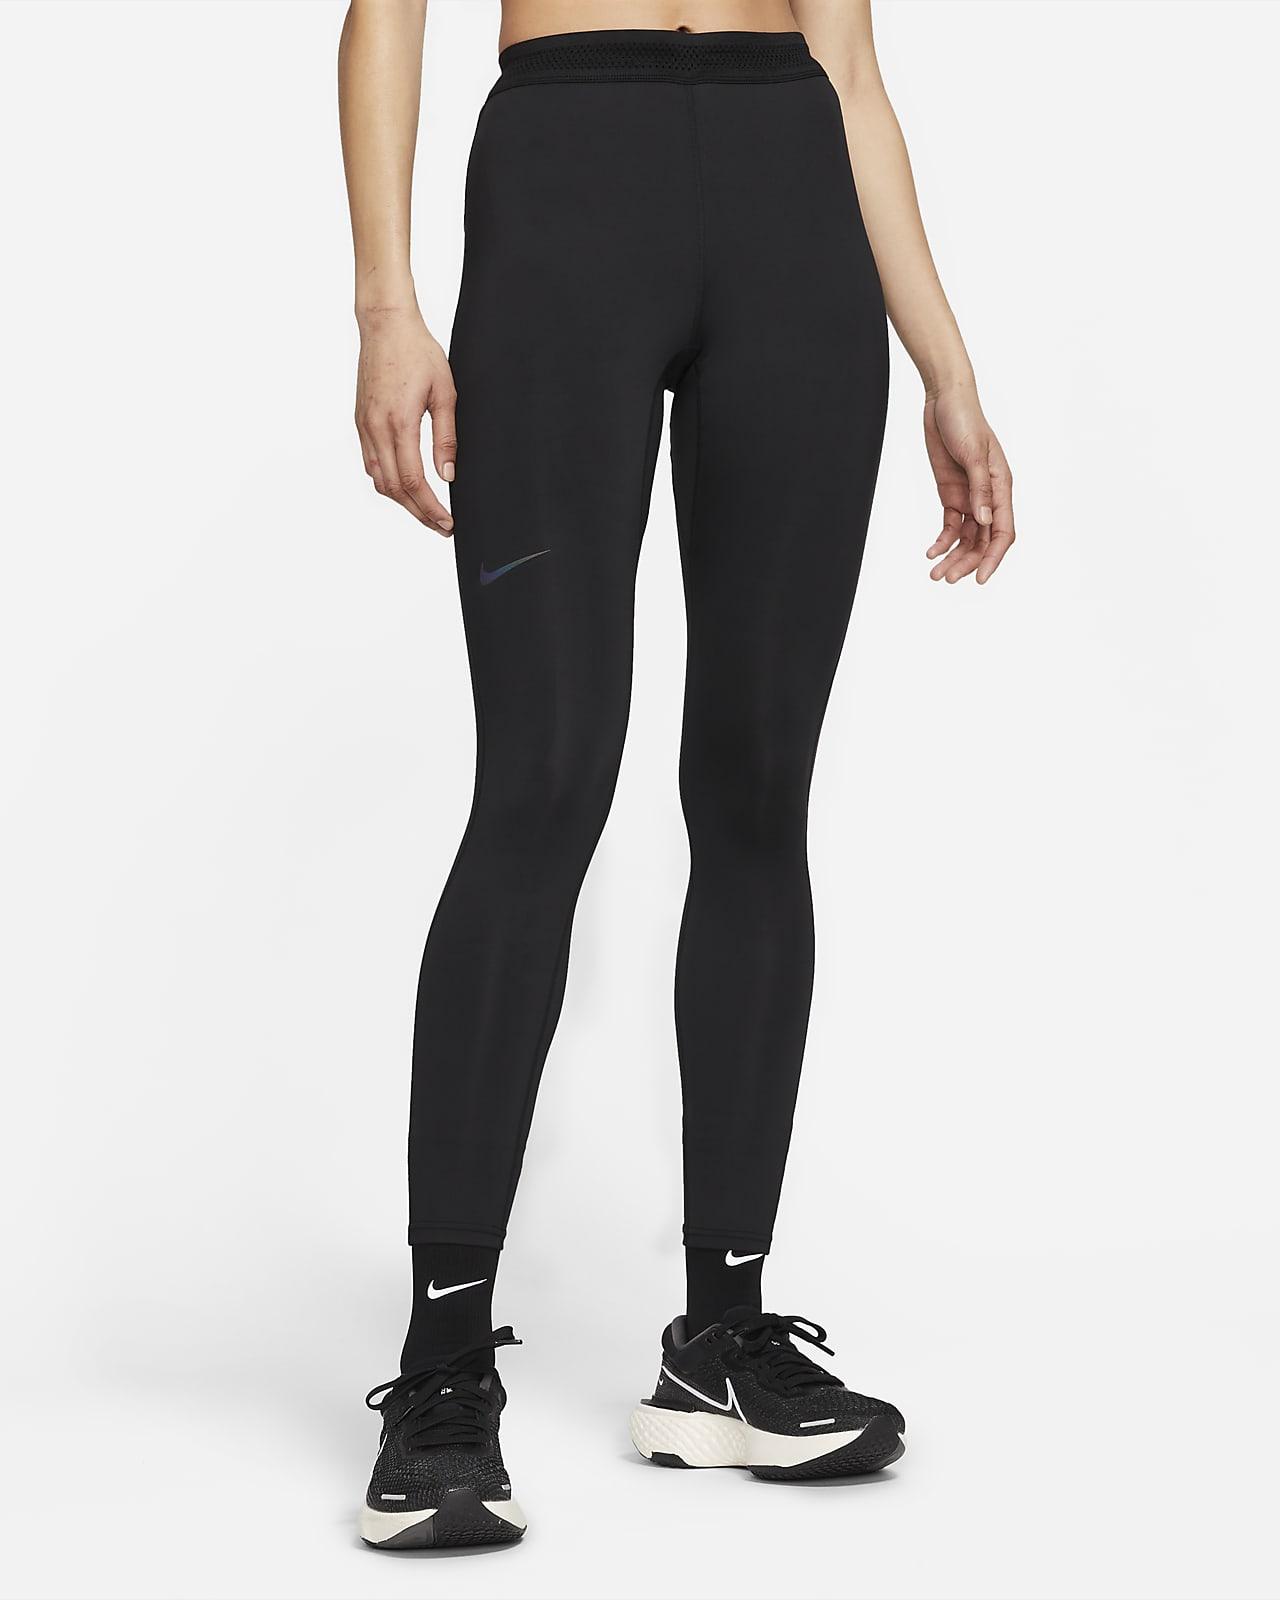 Nike Nike Sports Research Lab Damen-Tights